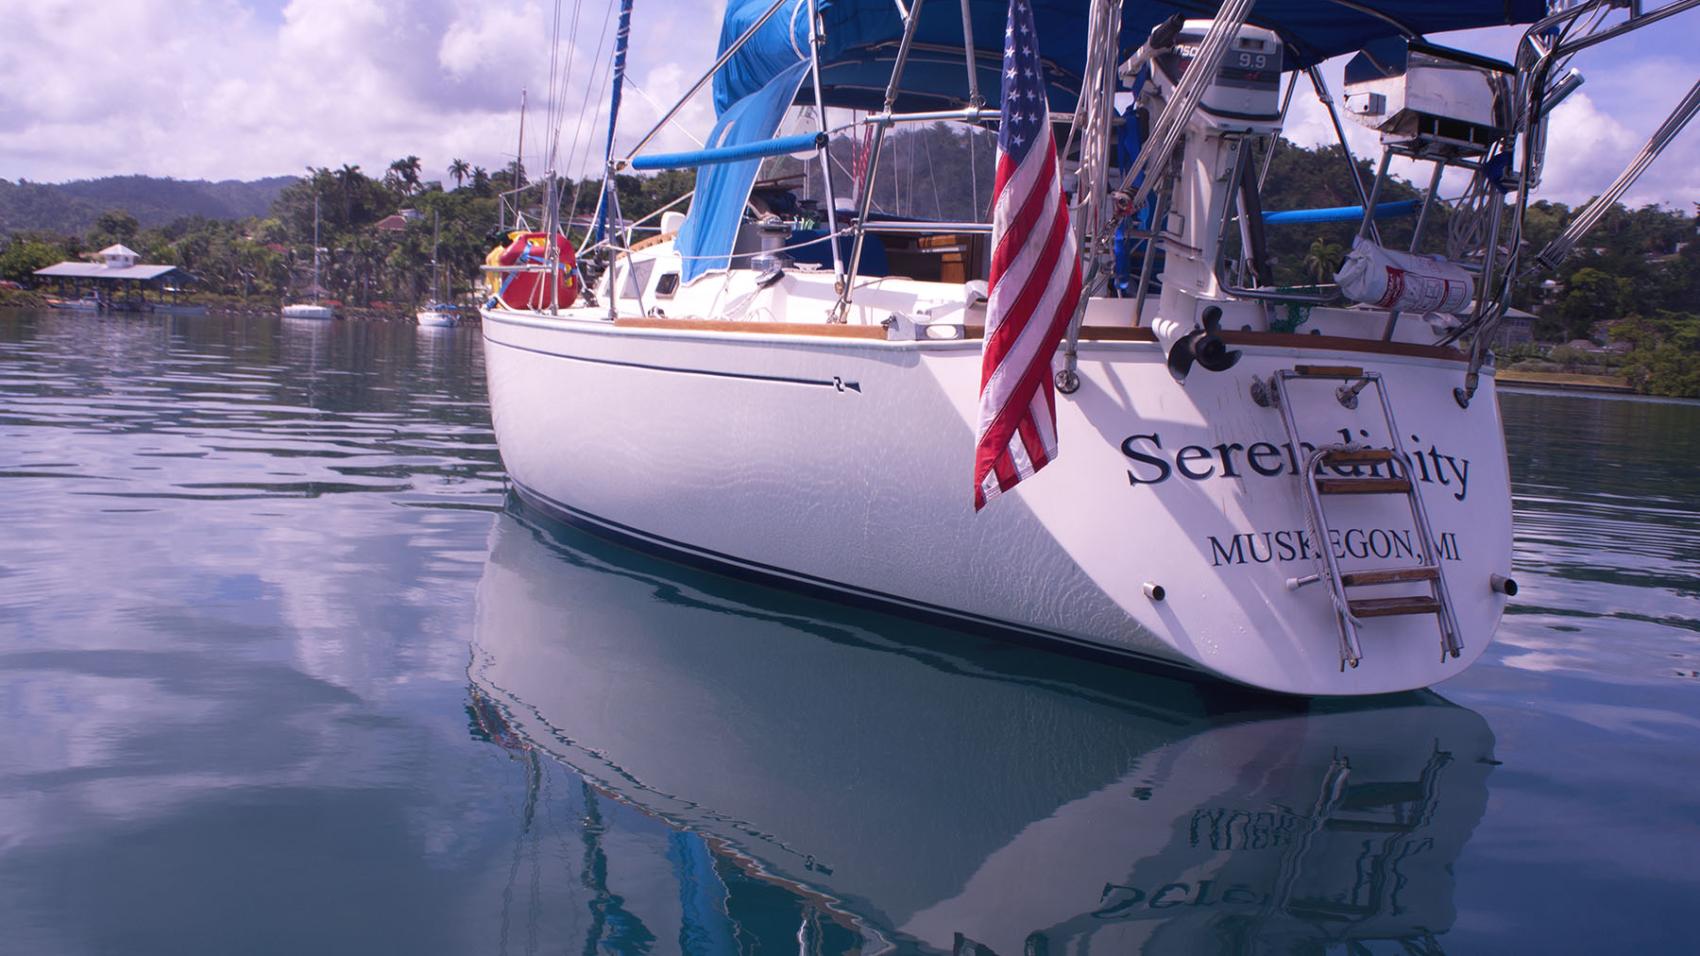 Serendipity in Port Antionio